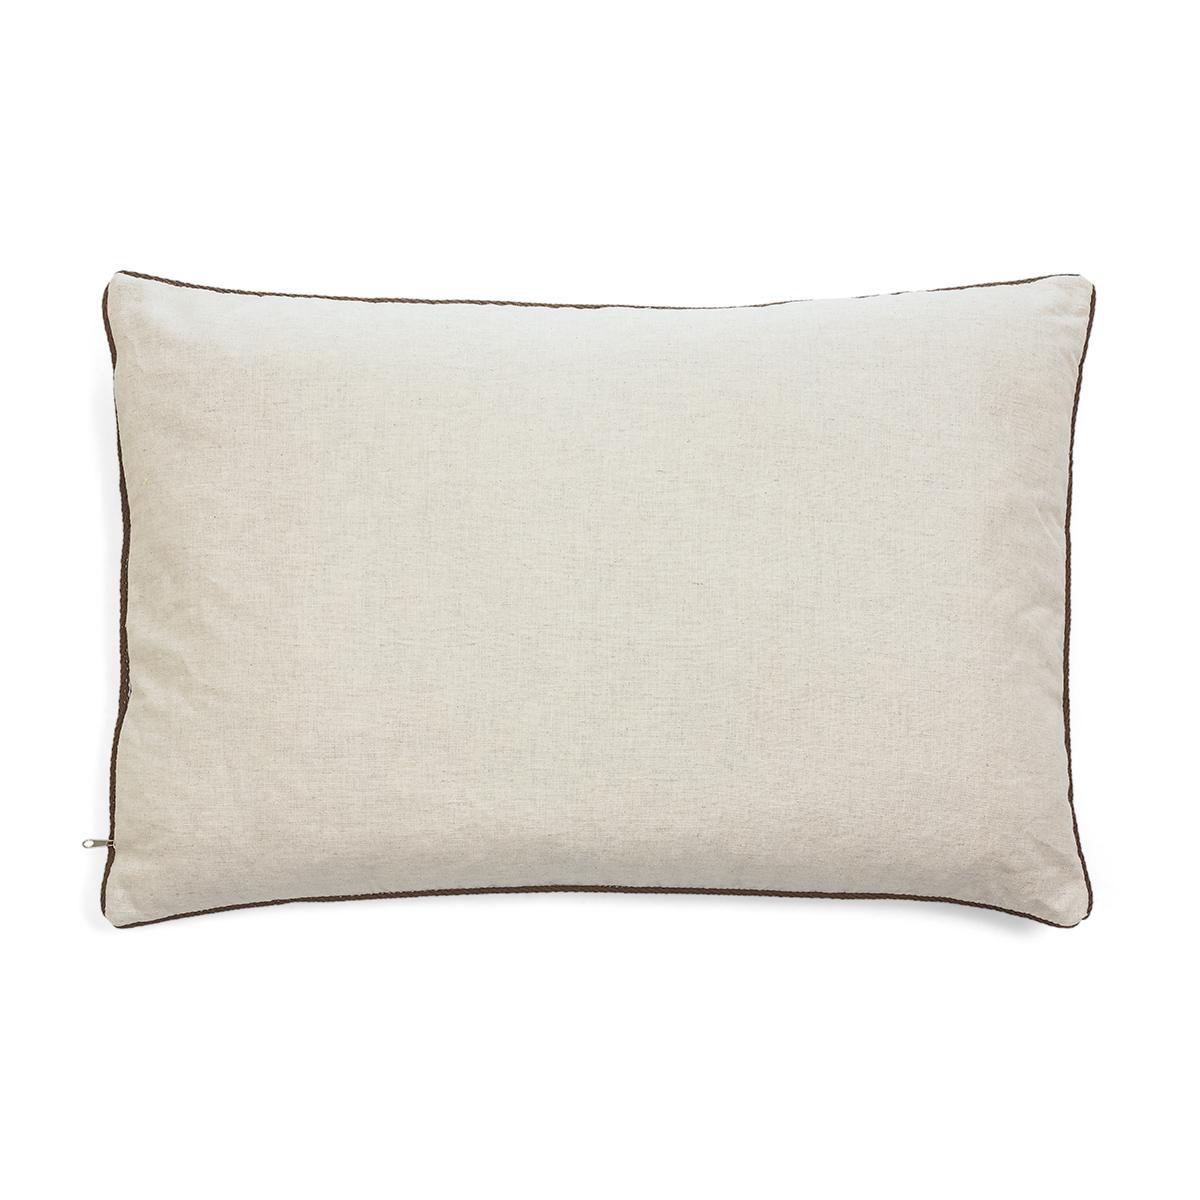 Подушка  Алтайская  р. 40х60 - Текстиль для здоровья артикул: 26284